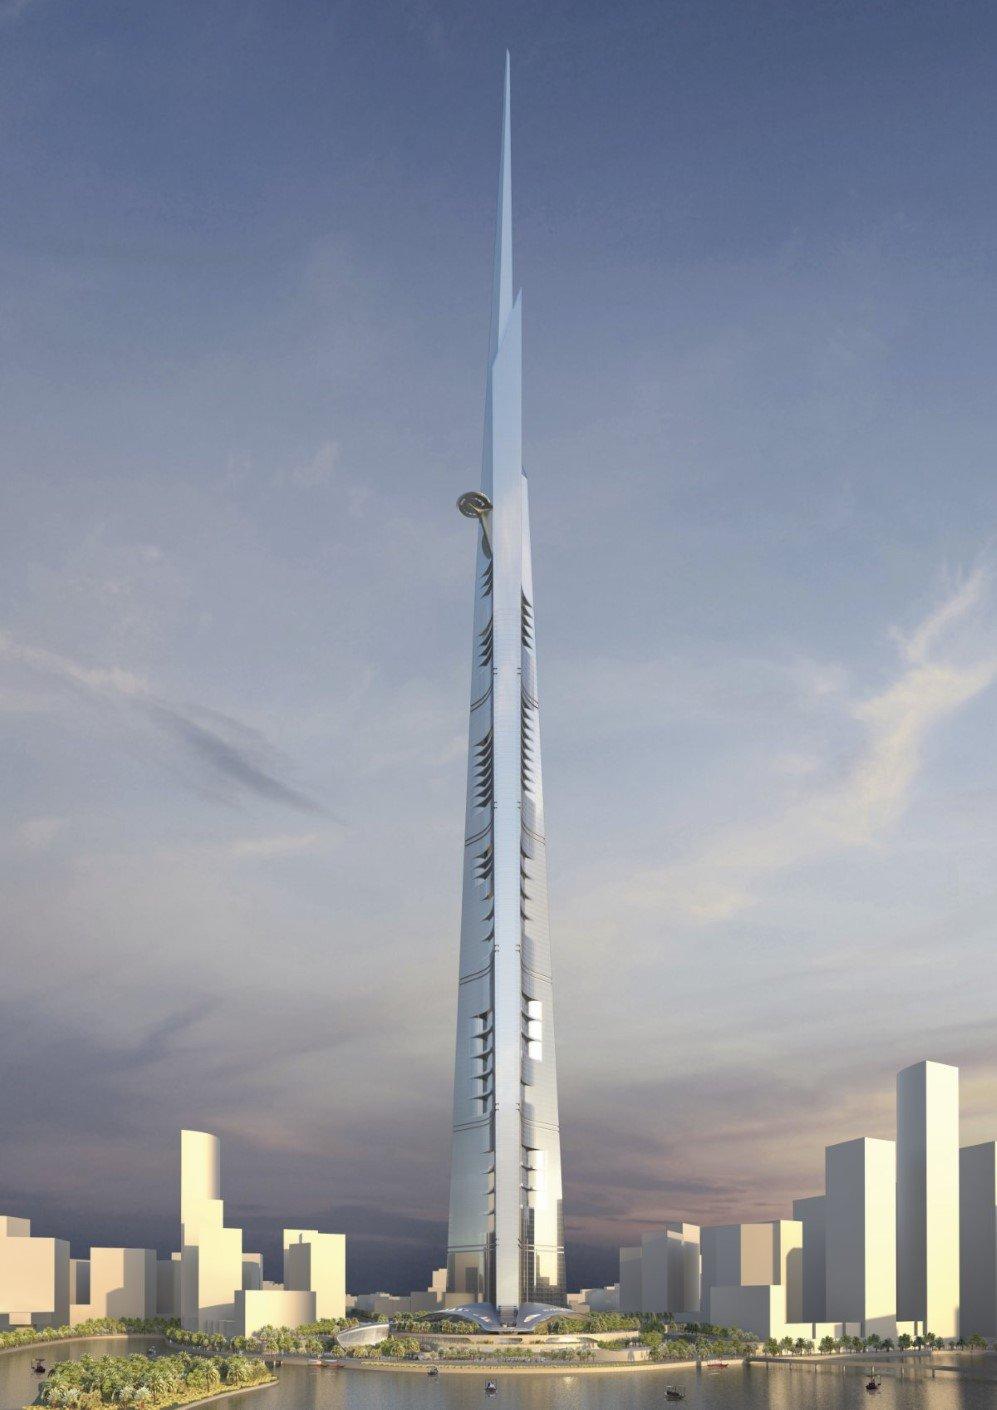 1. Kingdom Tower, Jeddah, Saudi Arabia